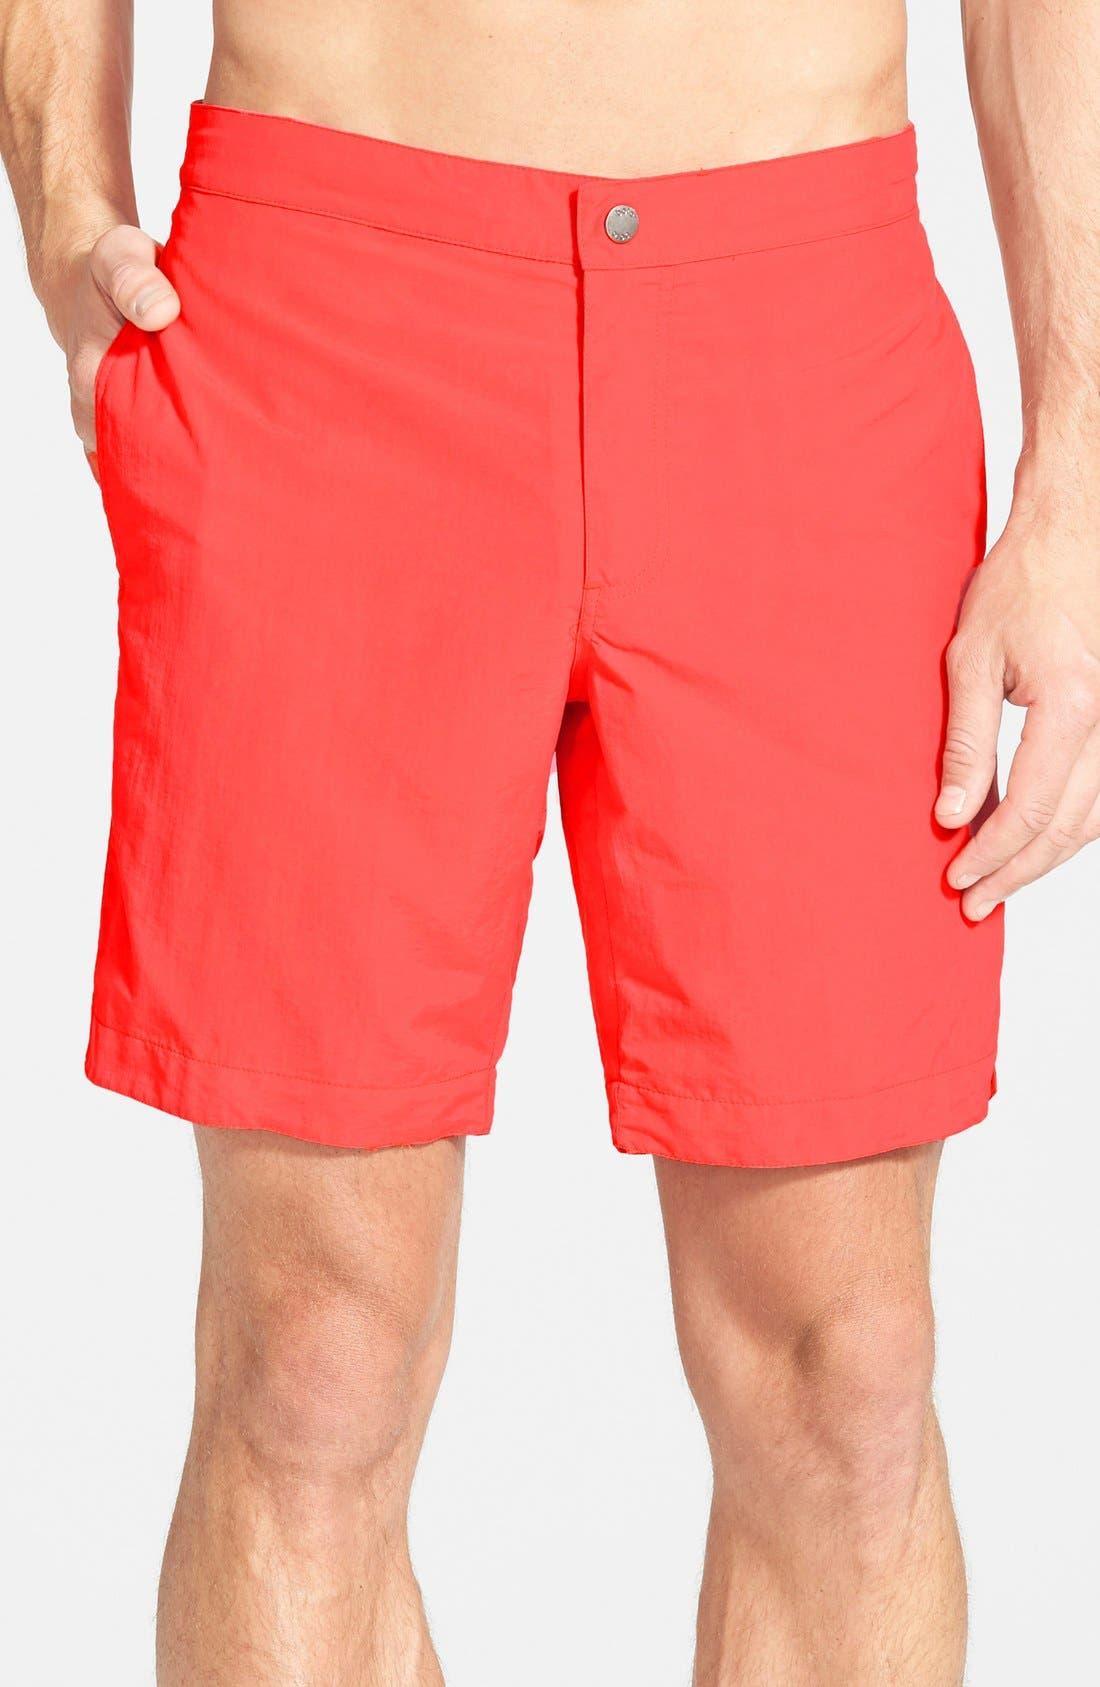 Main Image - boto 'Aruba - Island' Tailored Fit 8.5 Inch Board Shorts